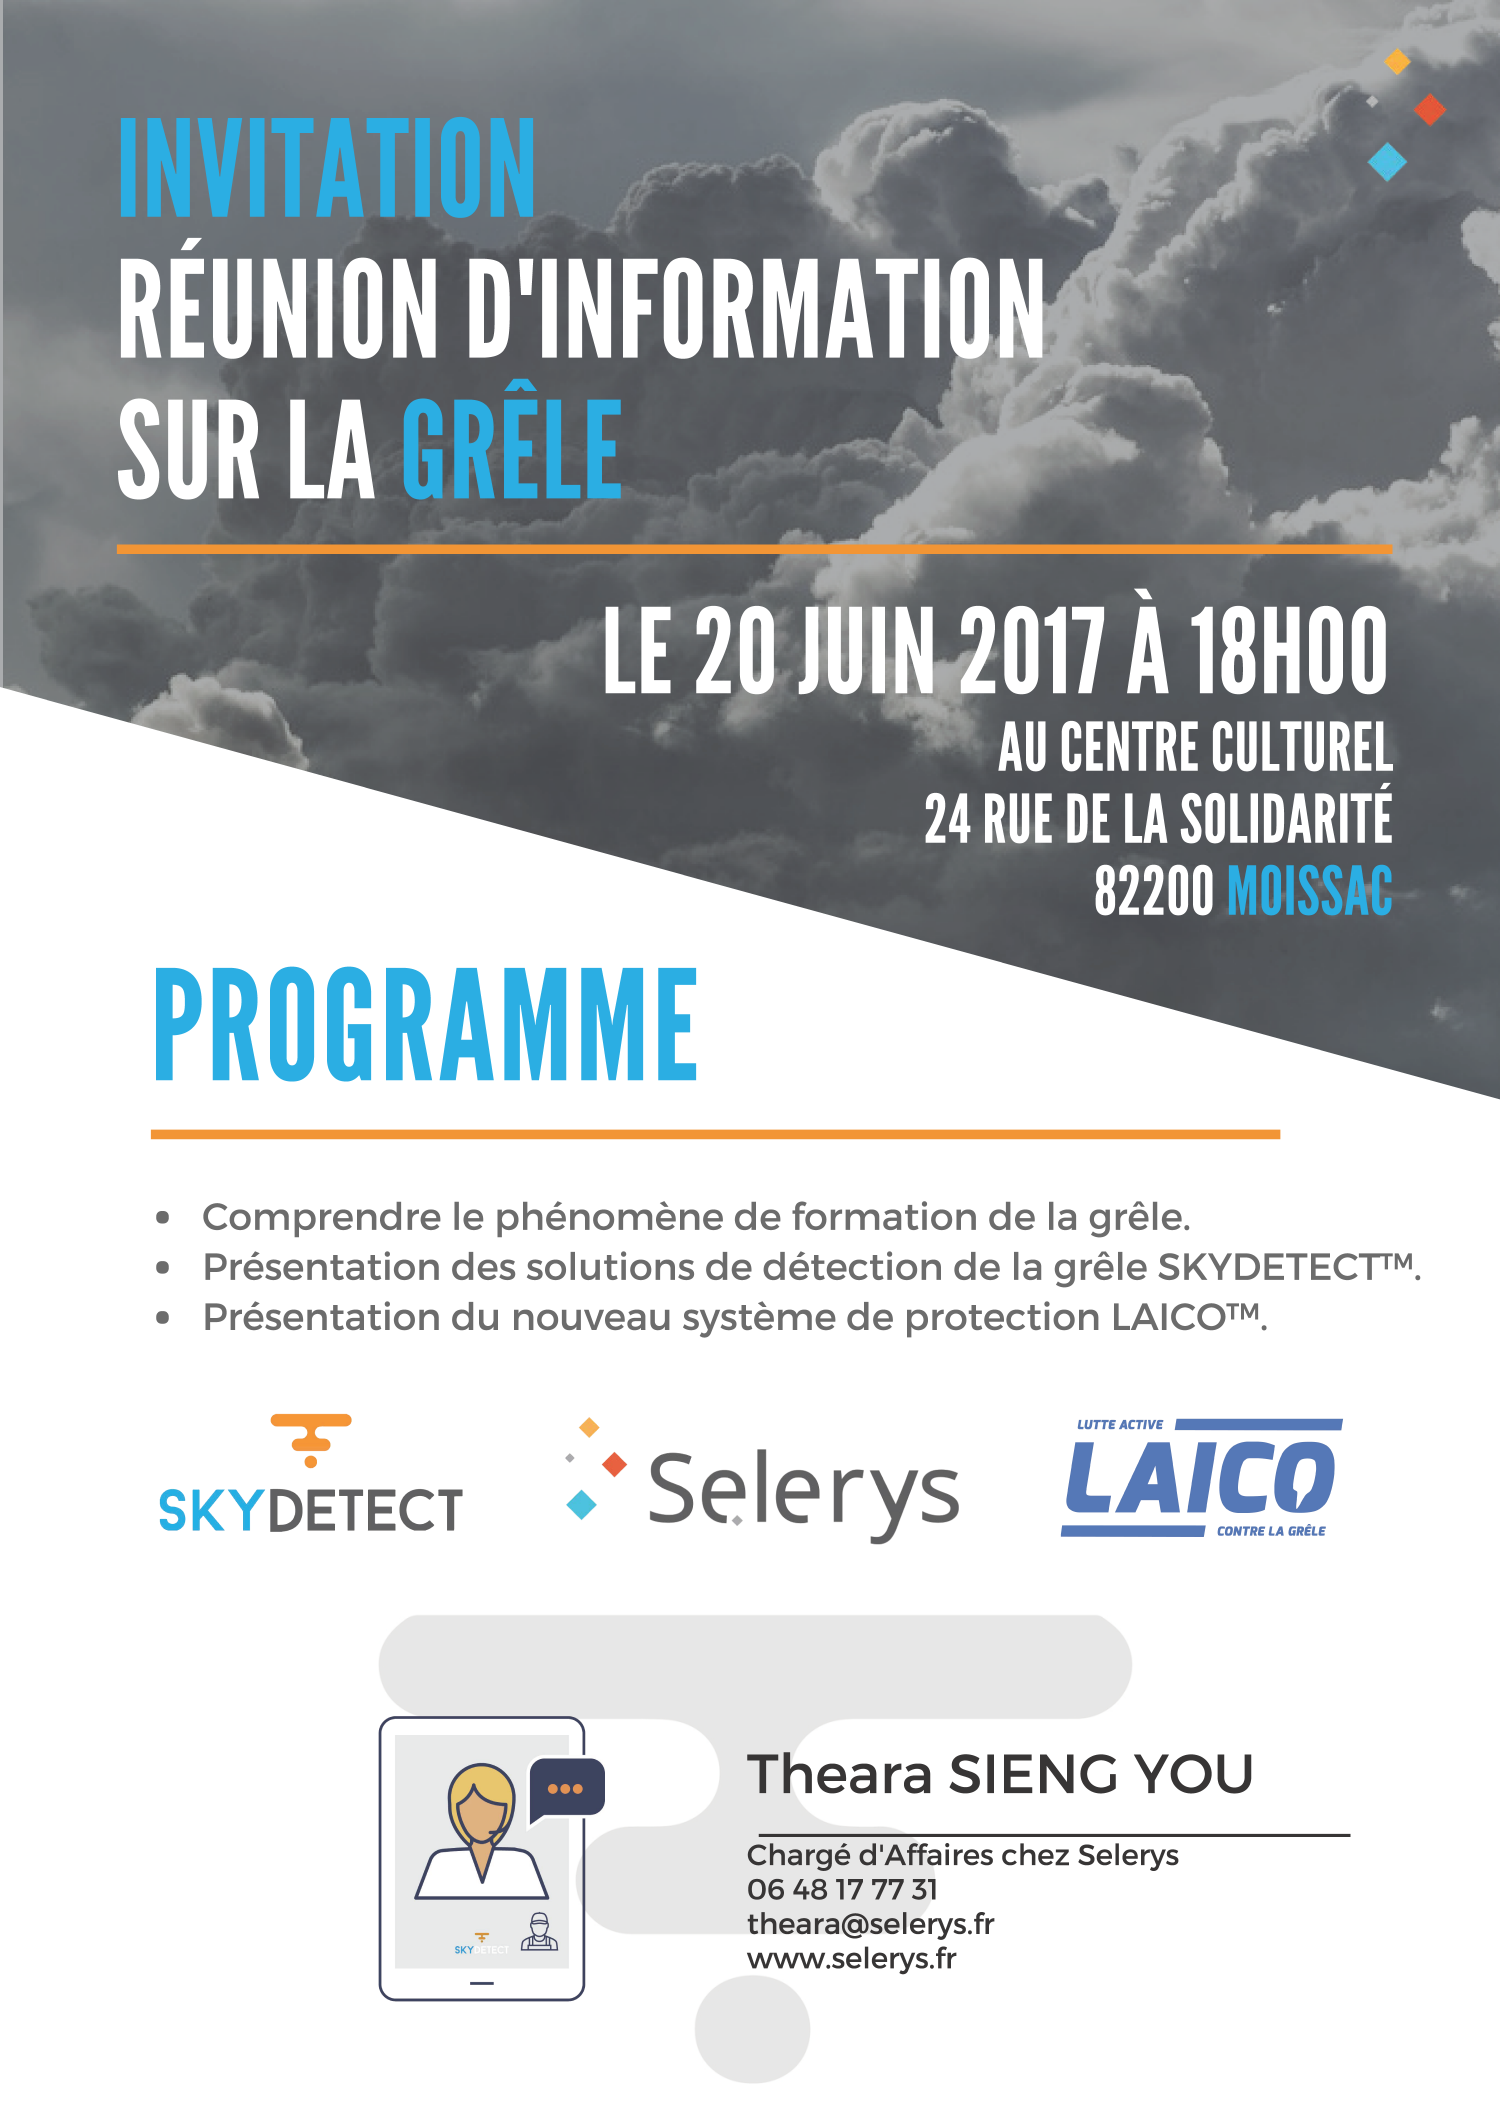 invitation-reunion-dinformation-sur-la-grele-20-juin-2017-moissac